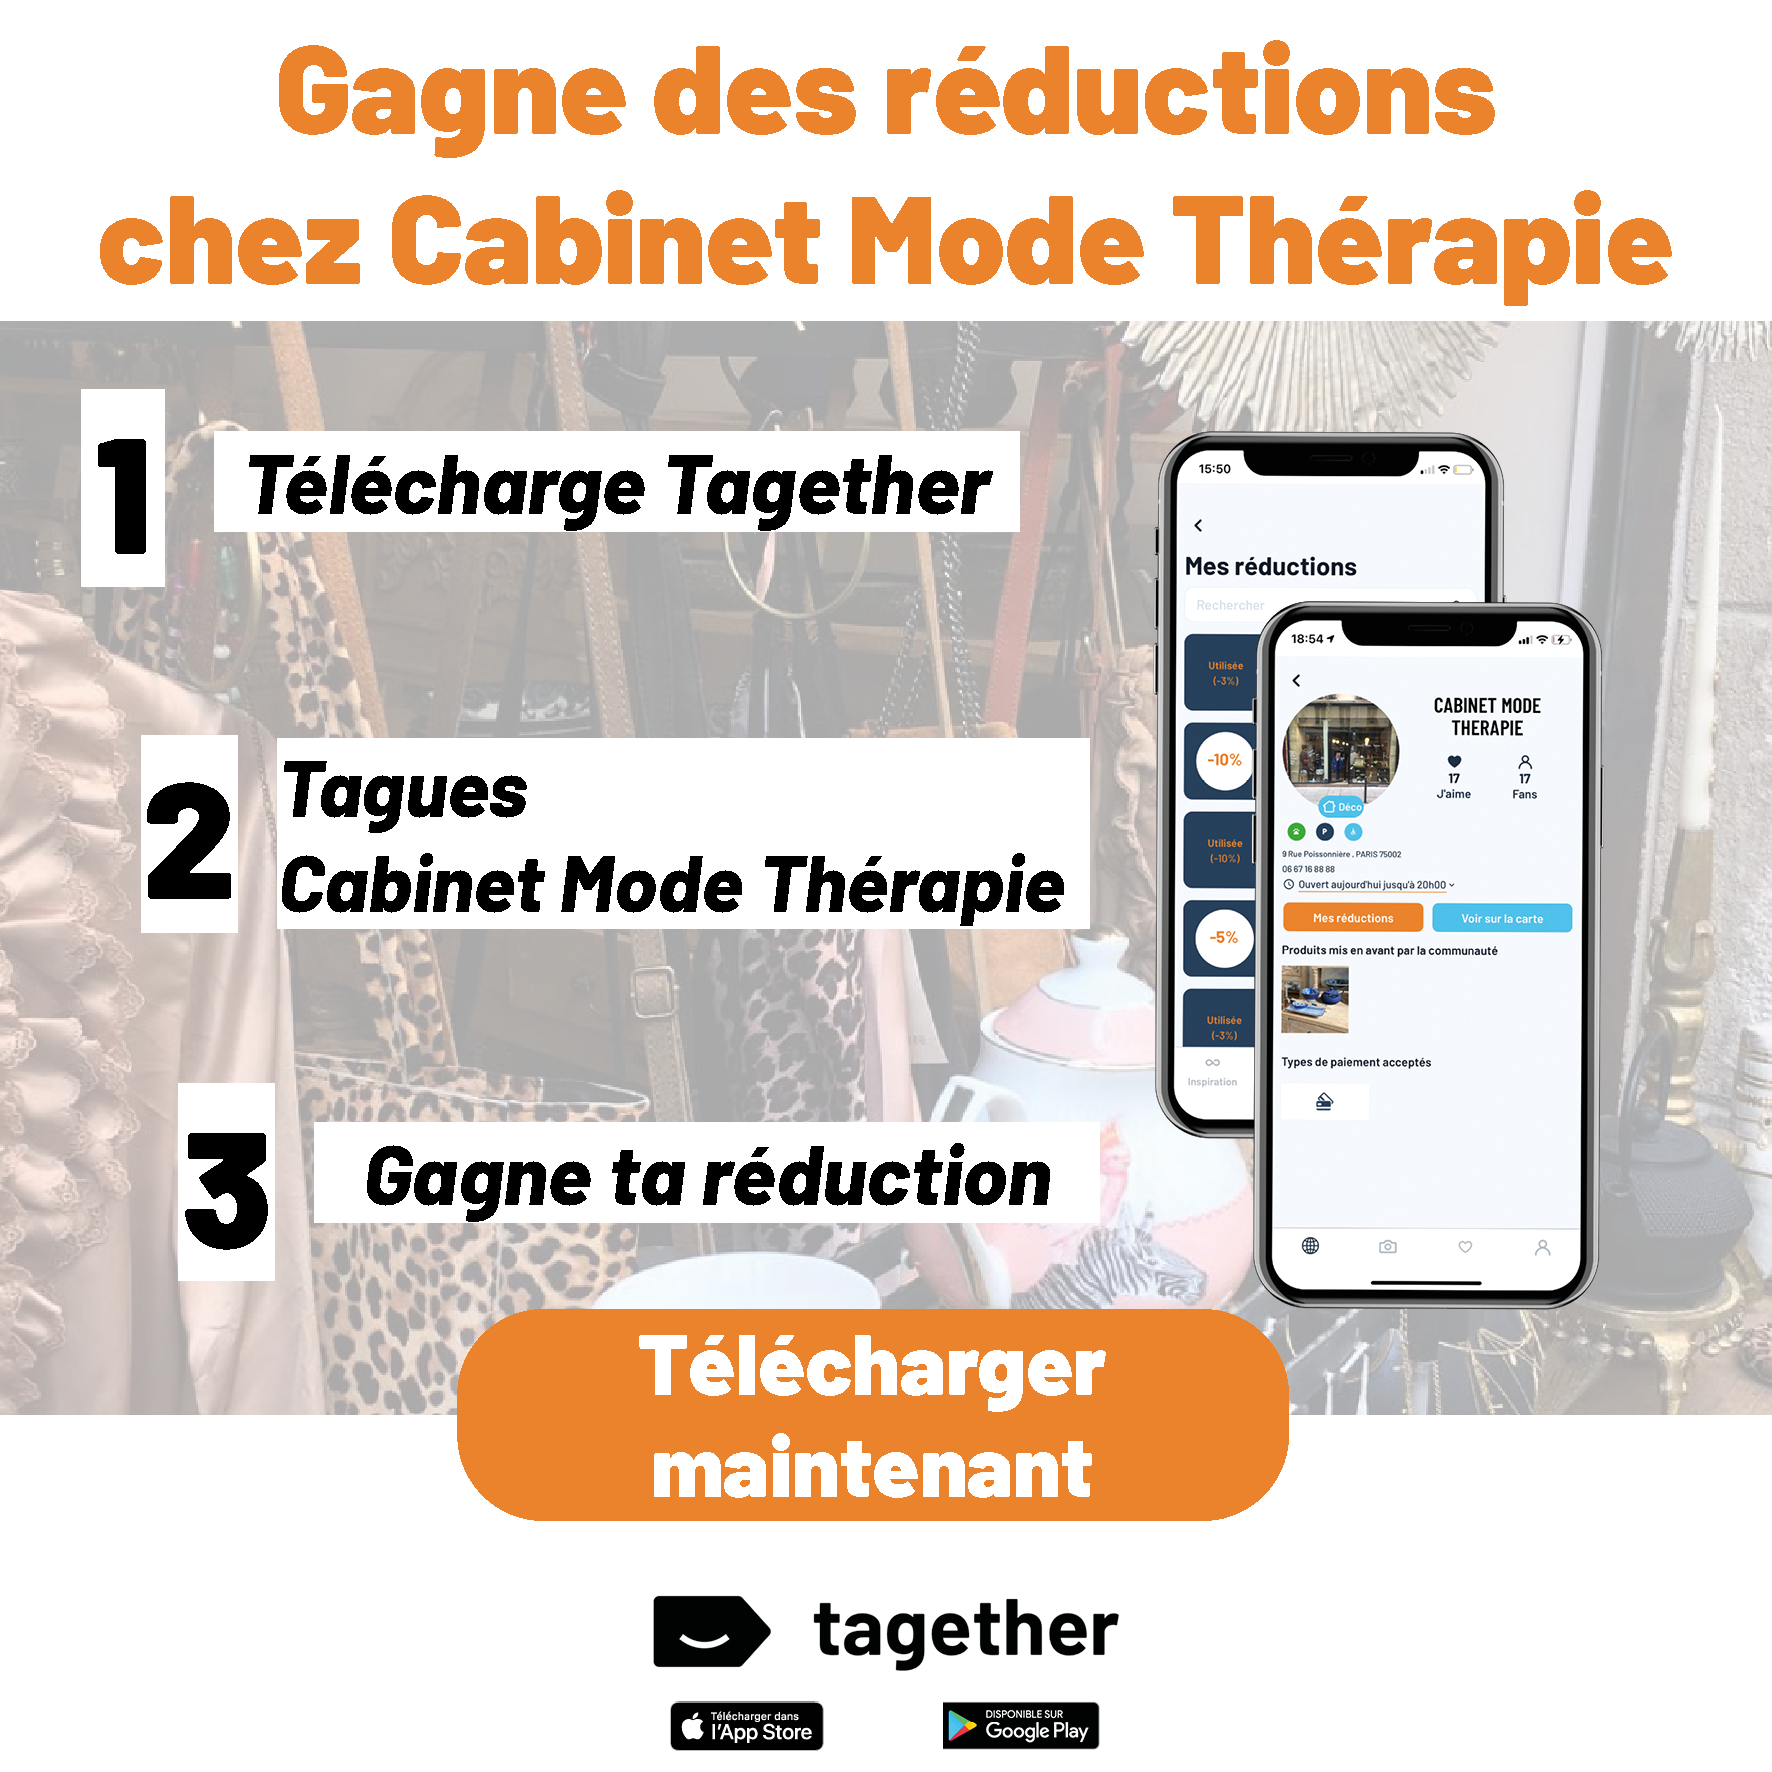 Cabinet Mode Thérapie